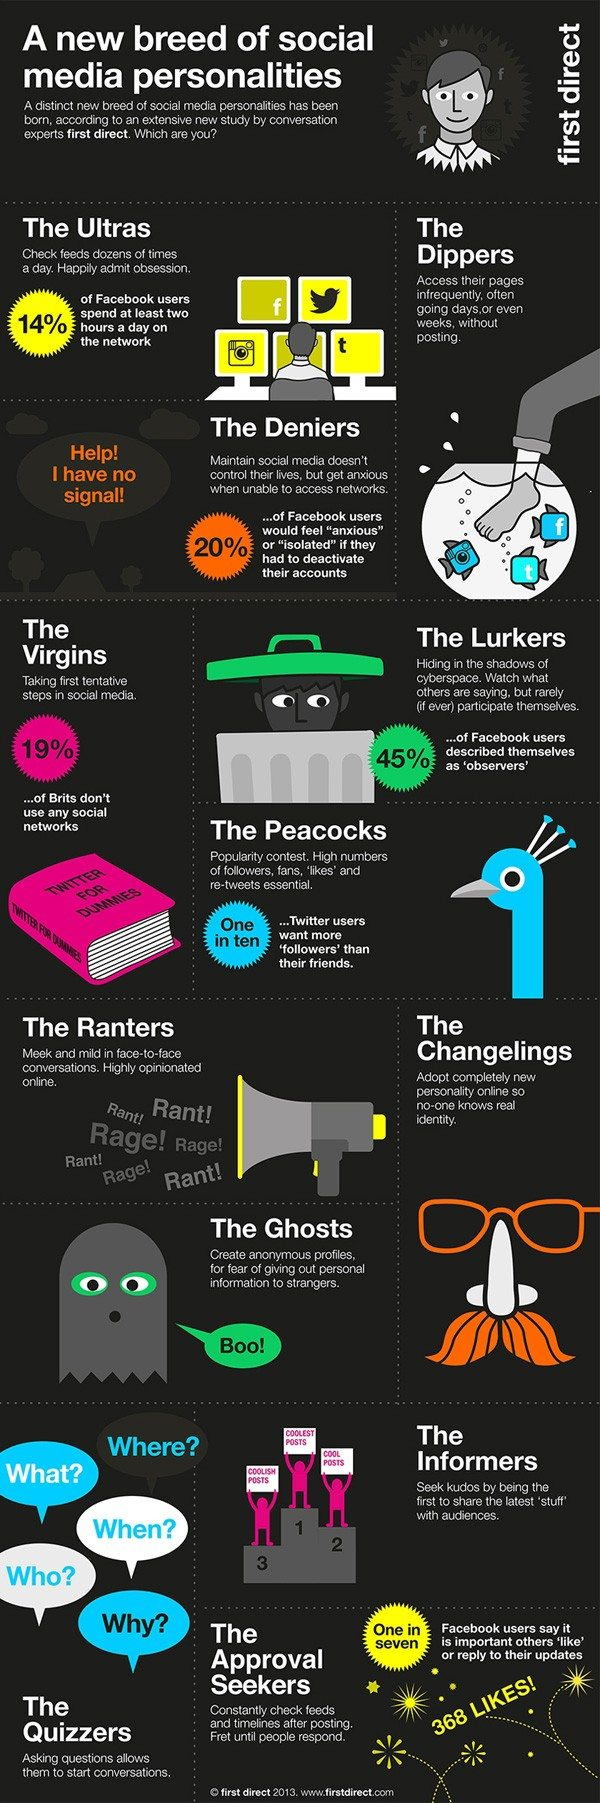 Social Media Personality Types